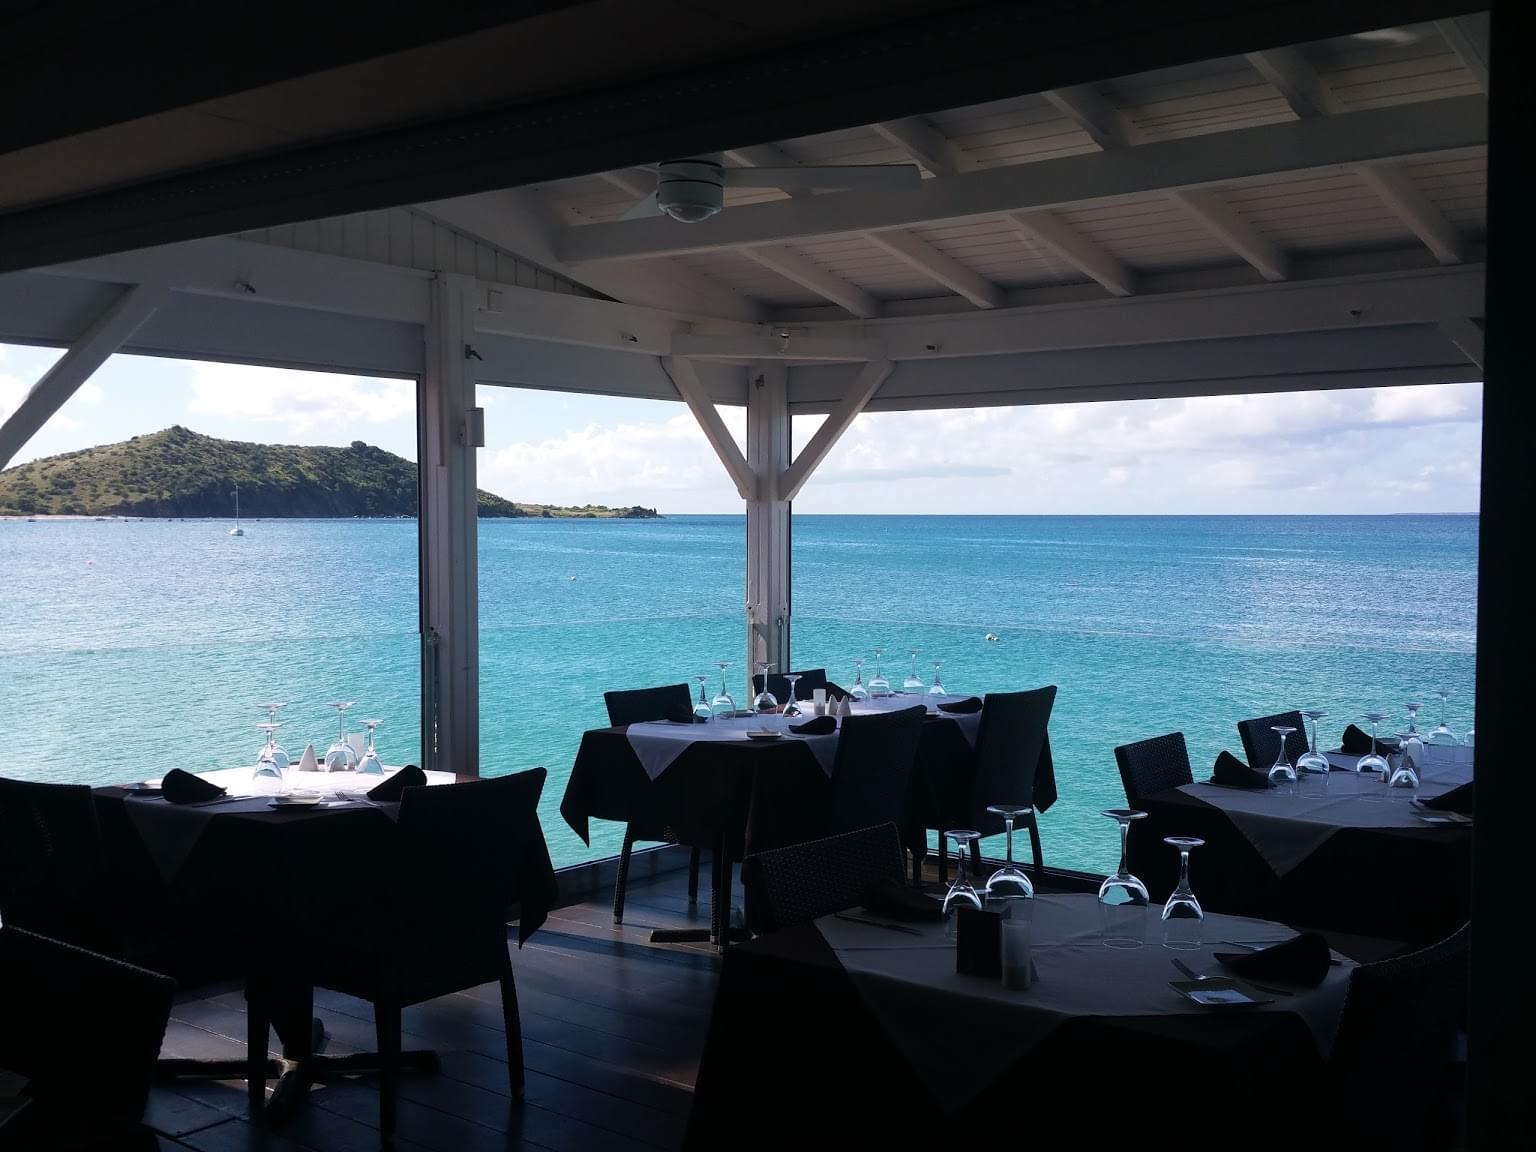 Ocean 82 restaurant in Grand-Case, Saint Martin patio seating ocean view